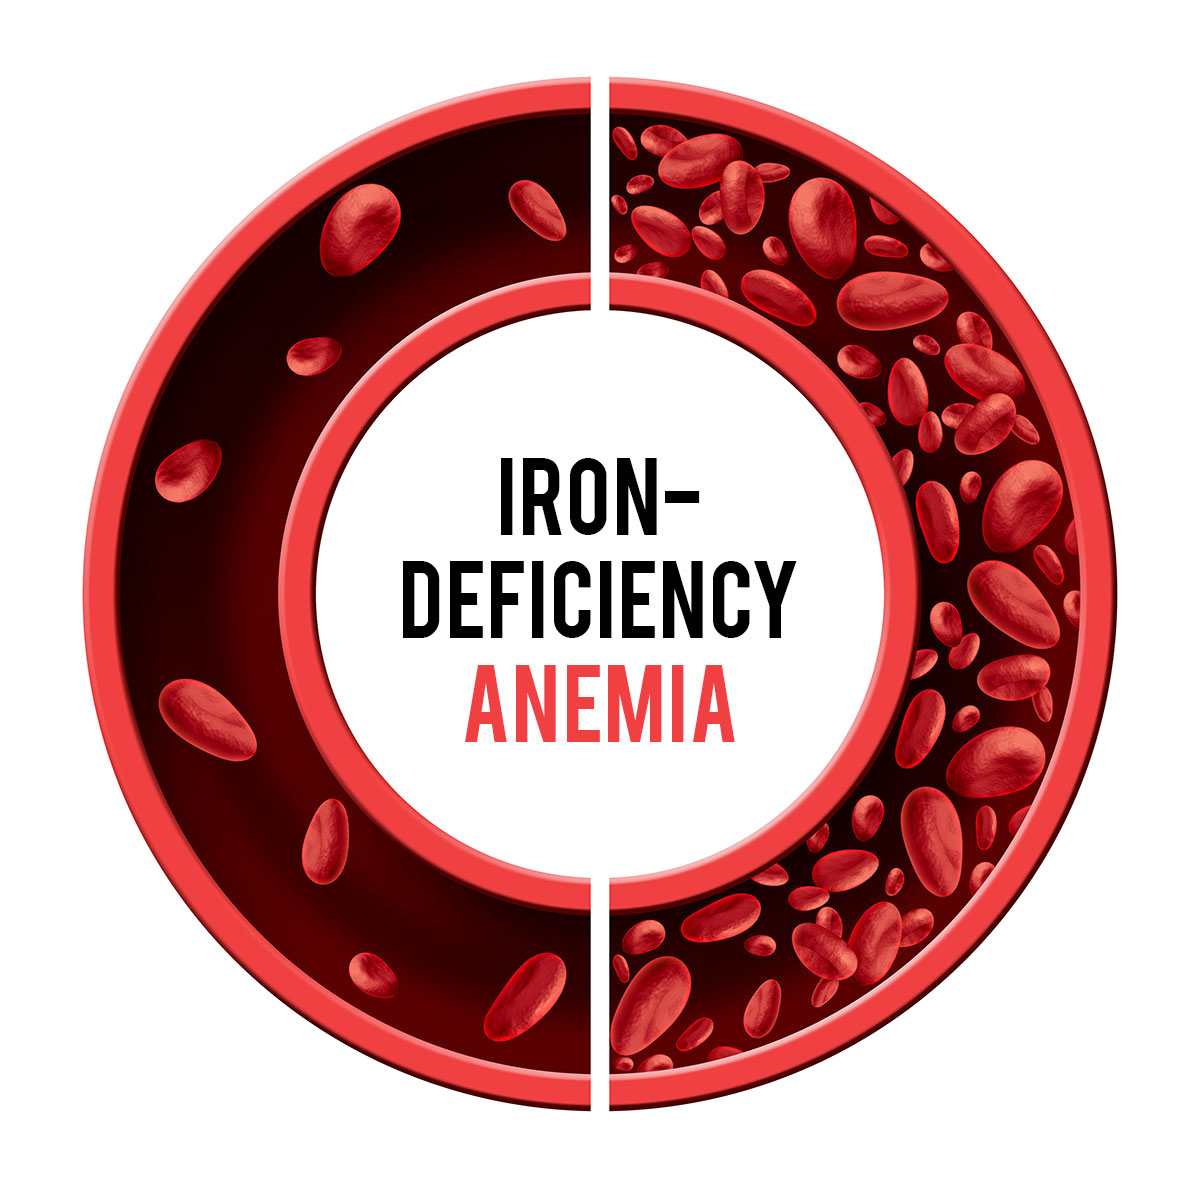 लोह कमतरते तून होणारा पंडुरोग / रक्तक्षय (Iron Deficiency Anaemia)